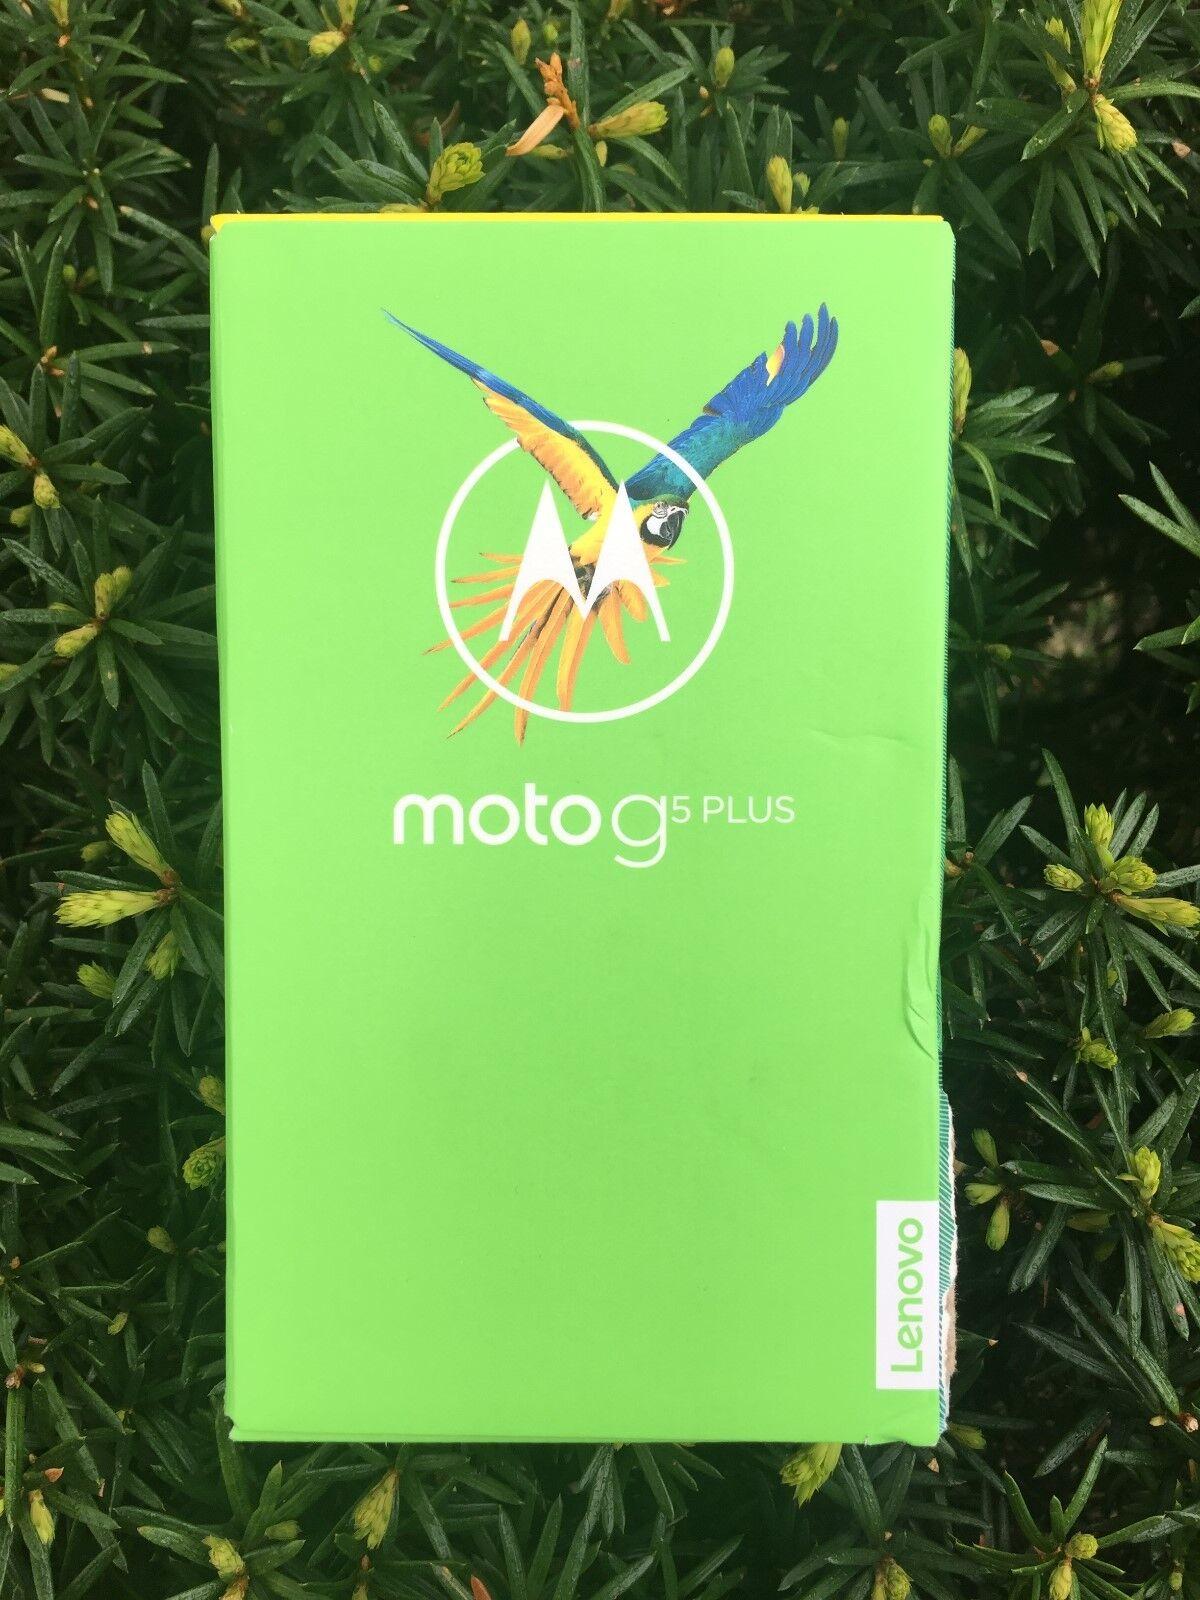 Motorola Moto G5 Plus 32GB UNLOCKED  Smartphone, Iron Gray NIB Sealed  Fast Ship